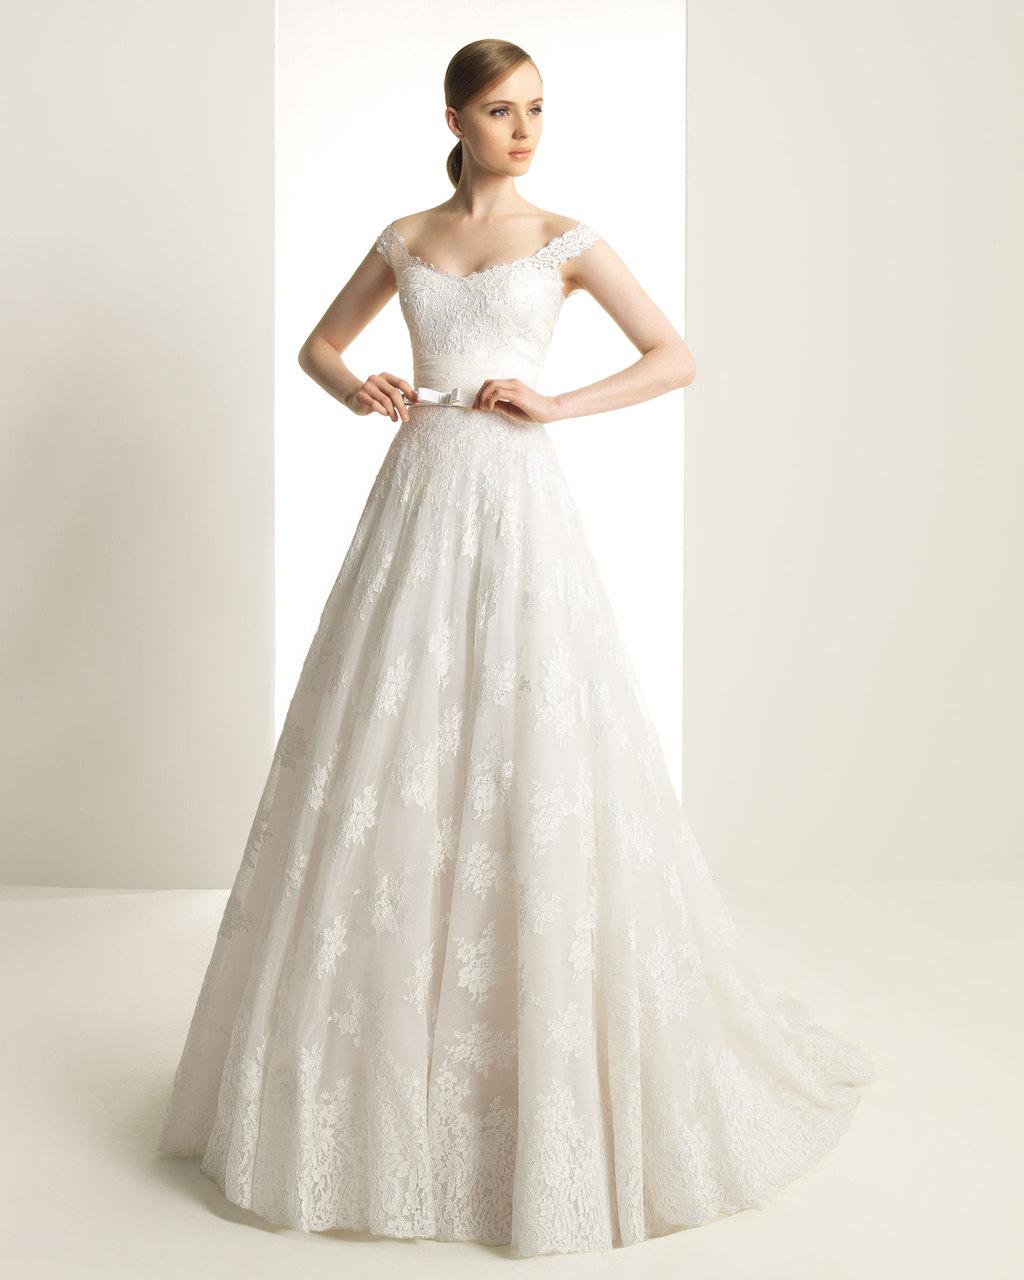 2013-wedding-dress-zuhair-murad-for-rosa-clara-bridal-gowns-109-kiev.full